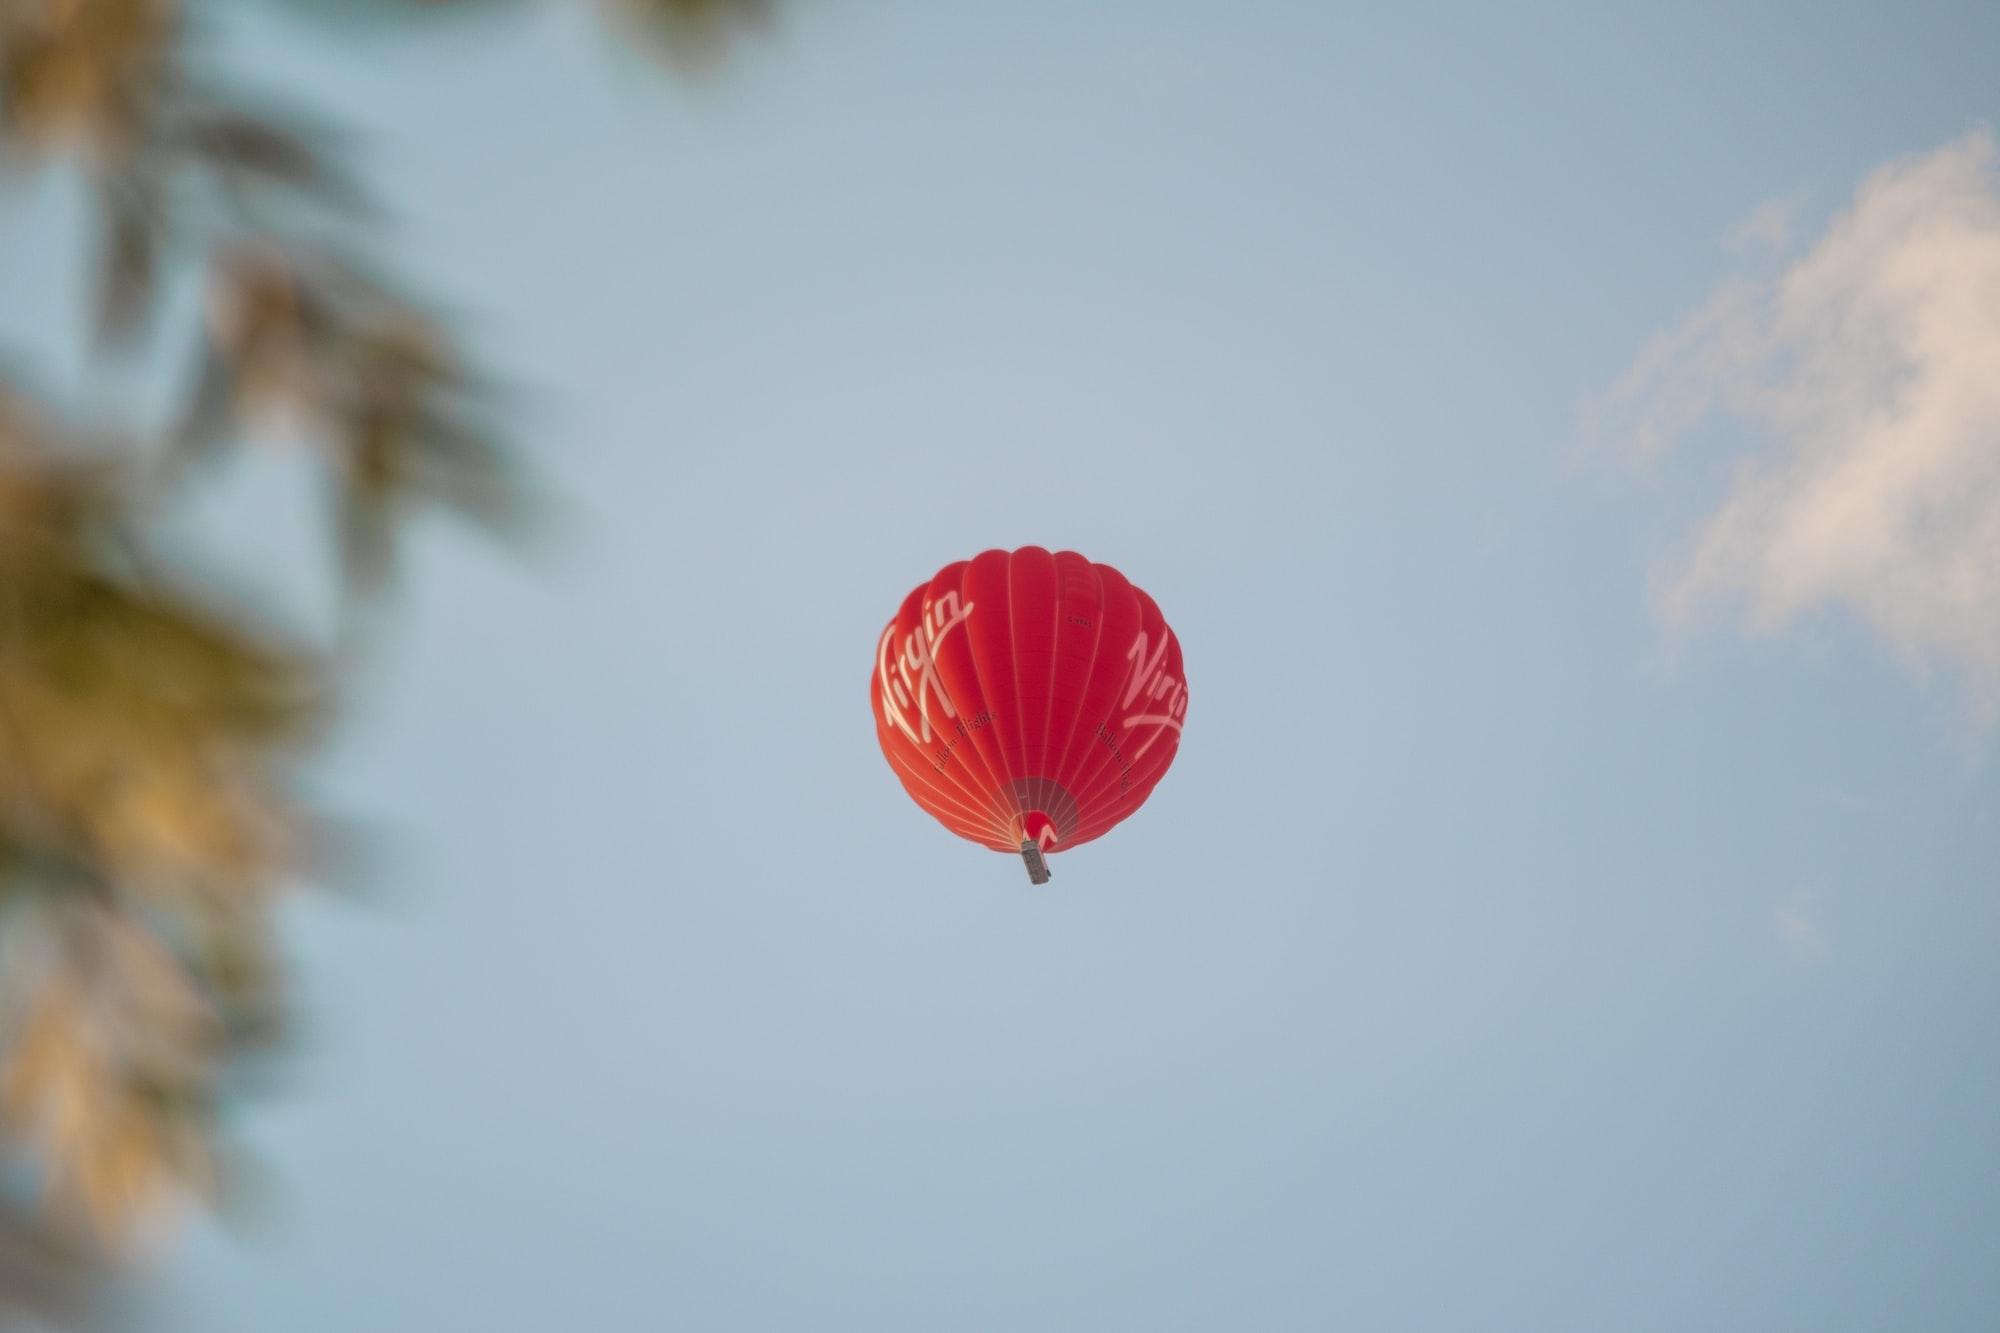 A Virgin Group hot air balloon high in the summer sky above New Bradwell / Wolverton, Milton Keynes.